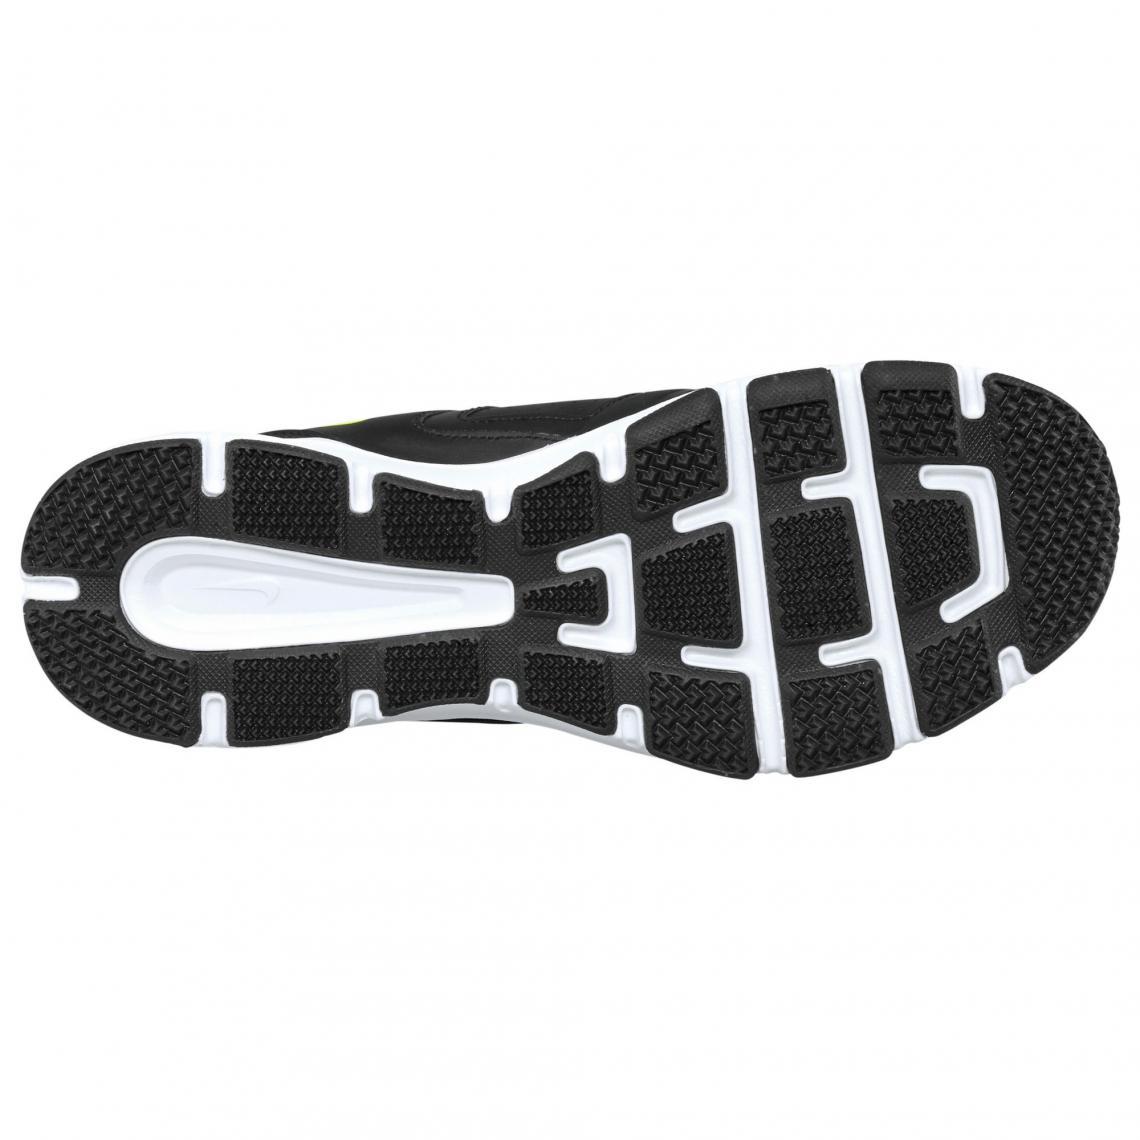 Bande 5923 Qw7t0hx Femme Originals Lin Baskets Adidas